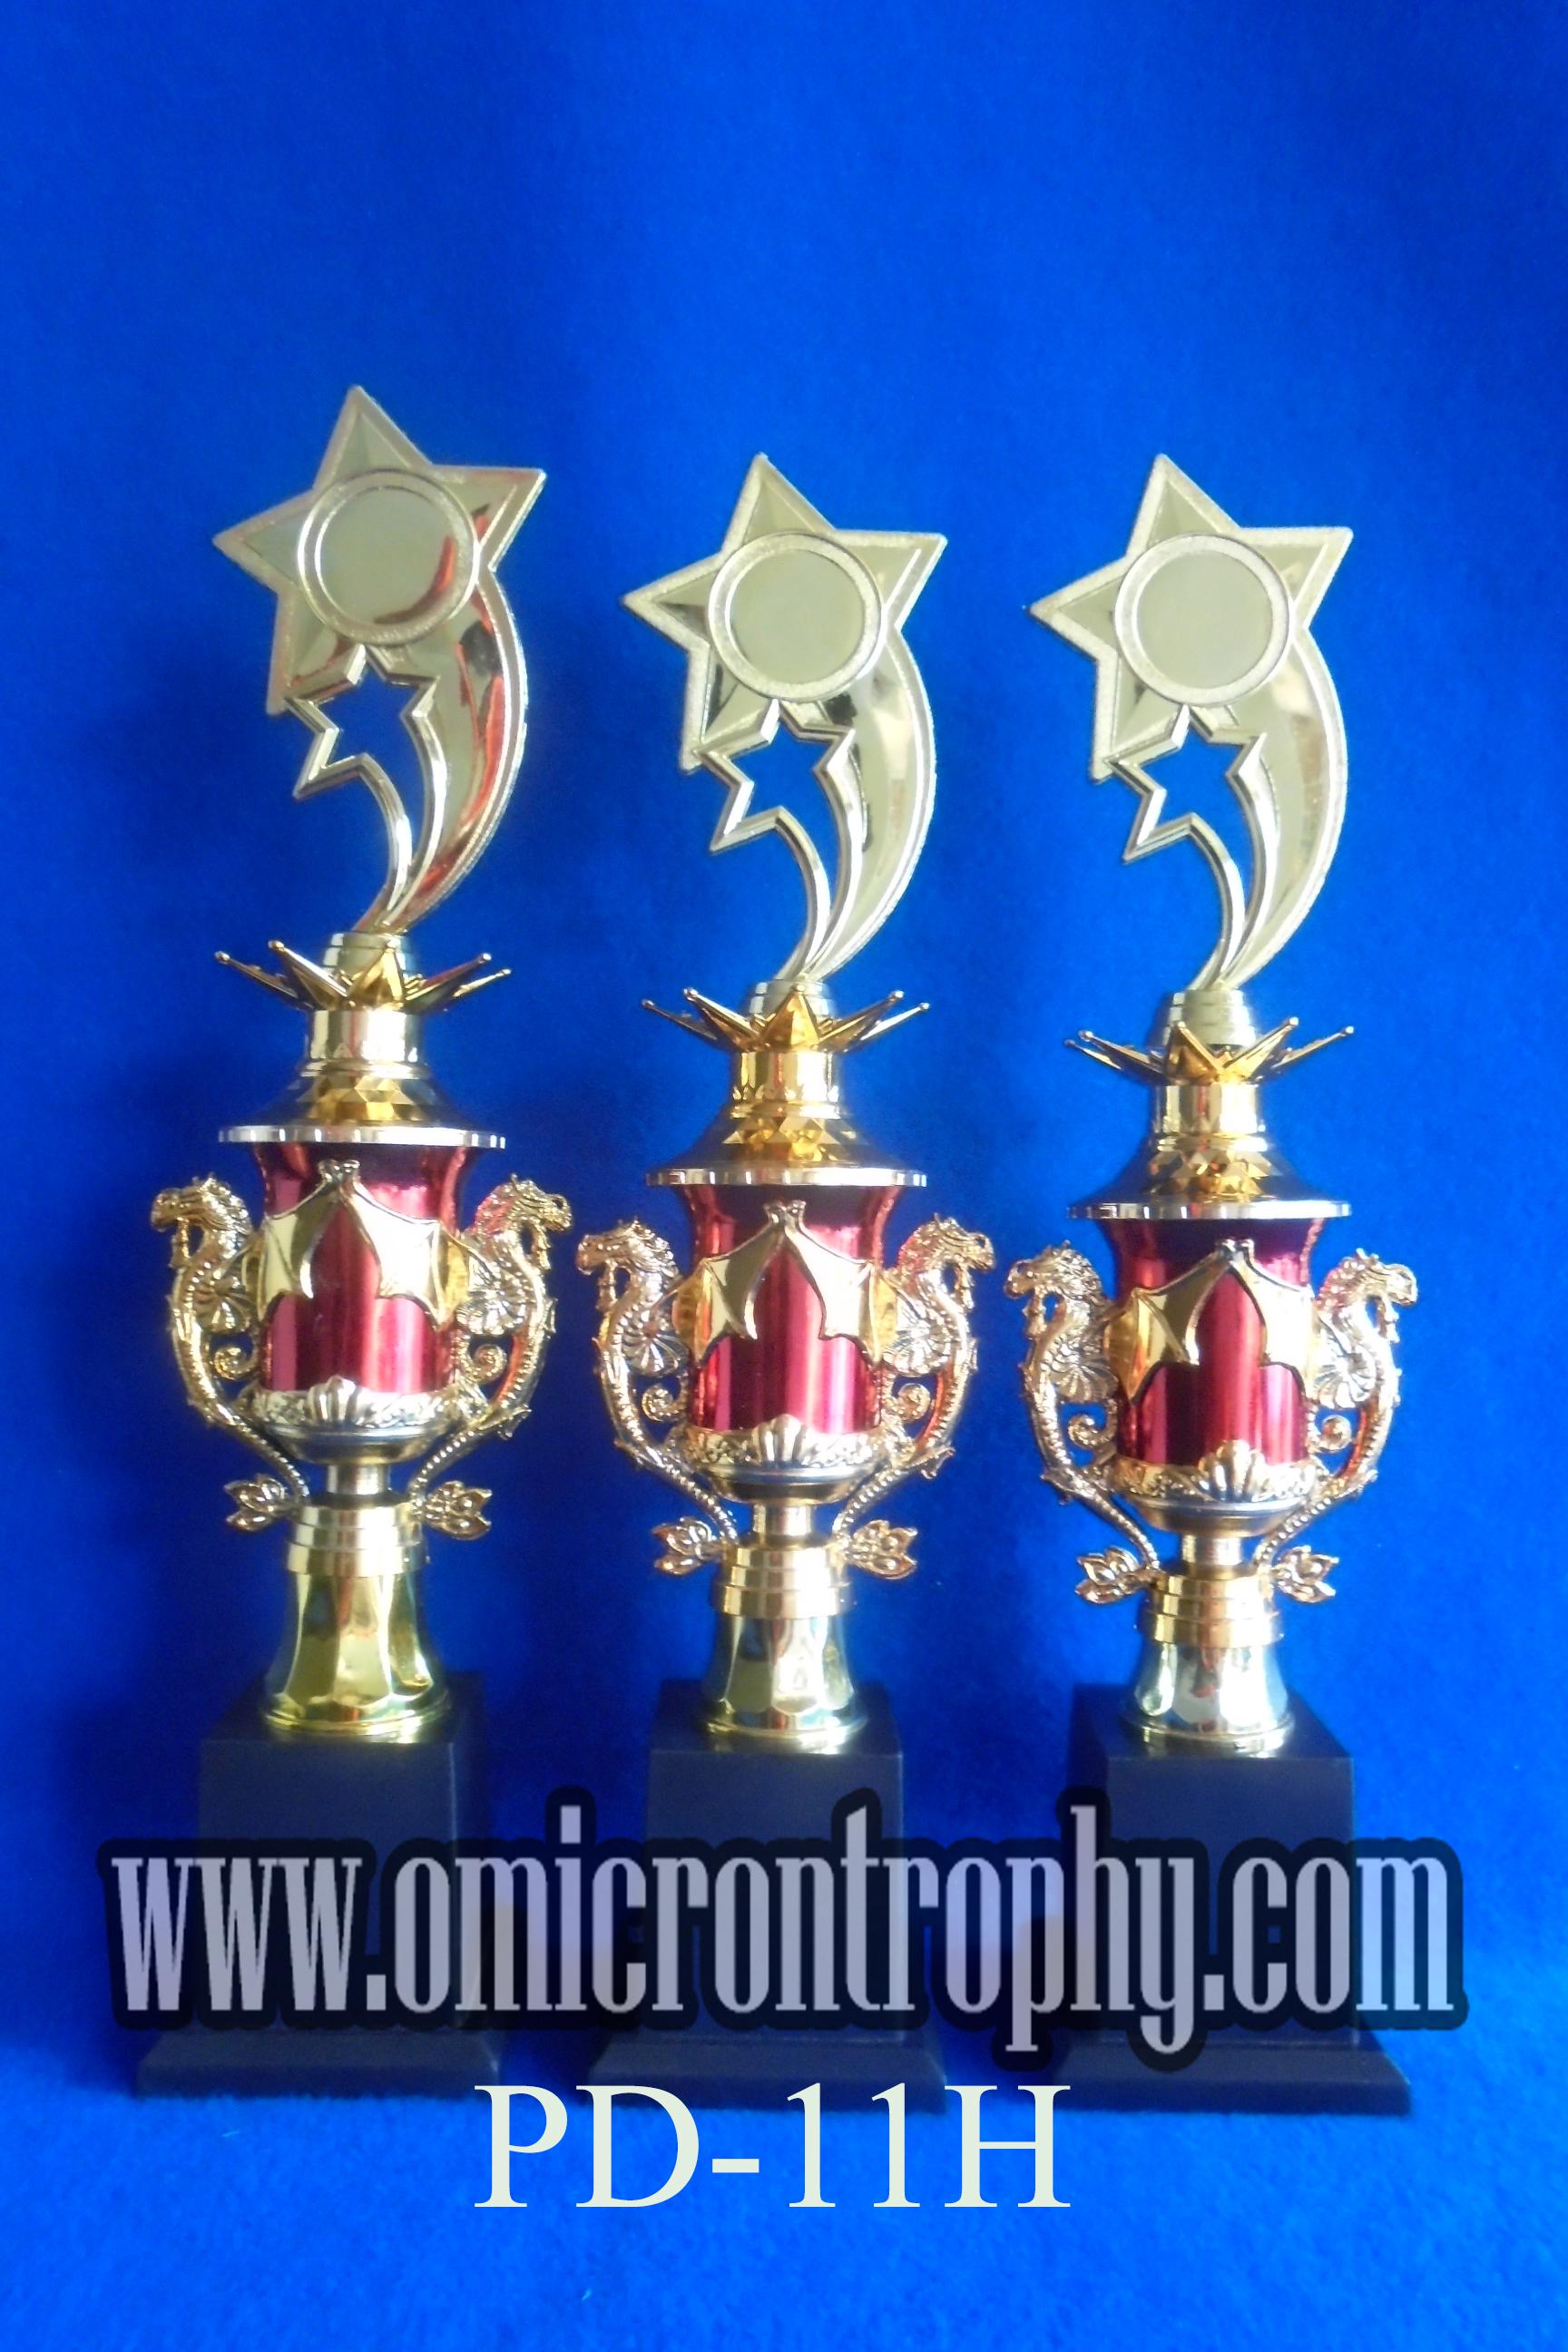 Produsen Piala Trophy Plastik Surabaya